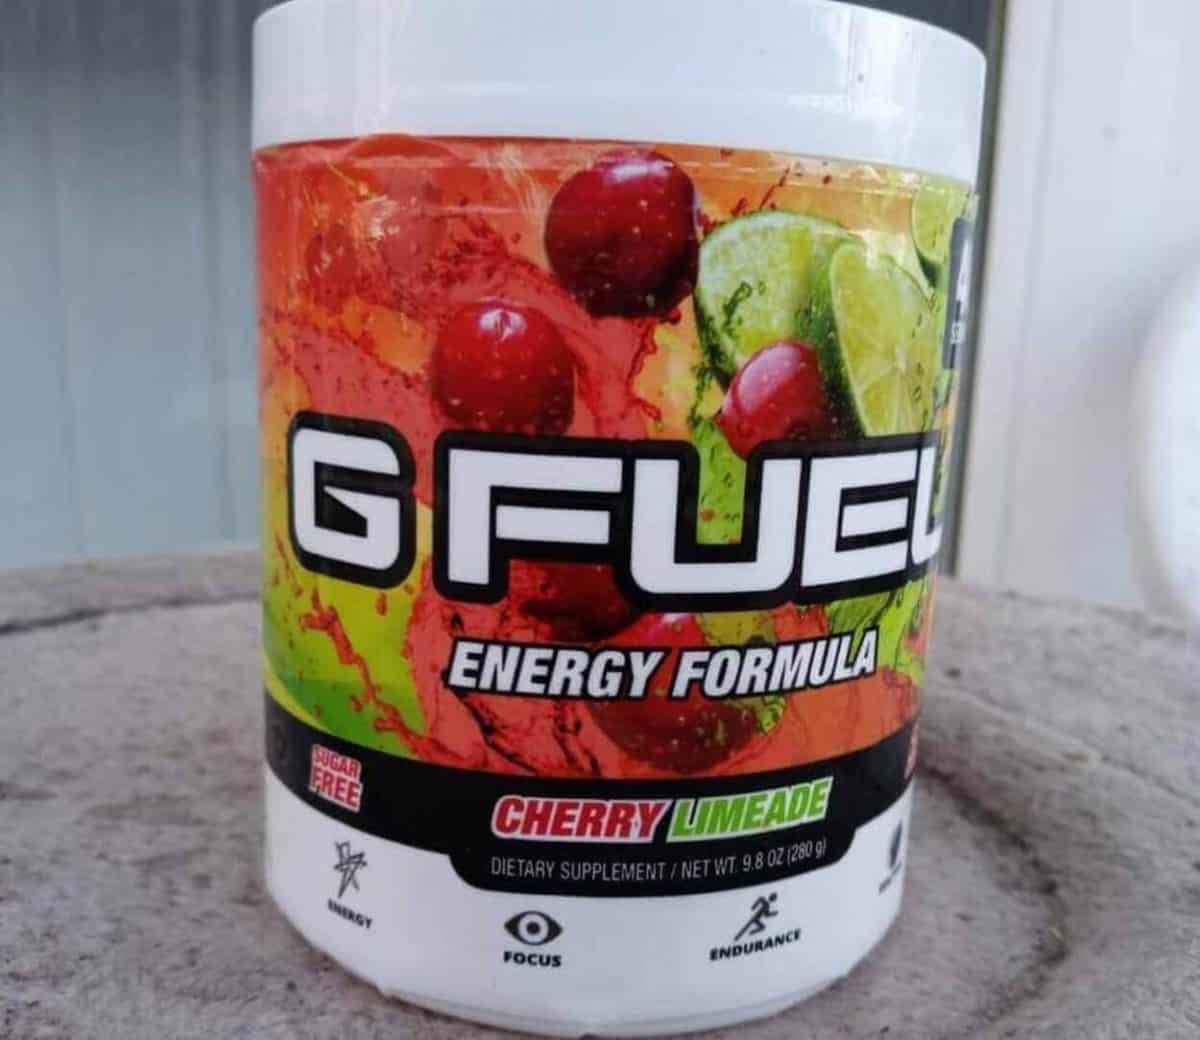 tub of energy drink, powdered energy drink